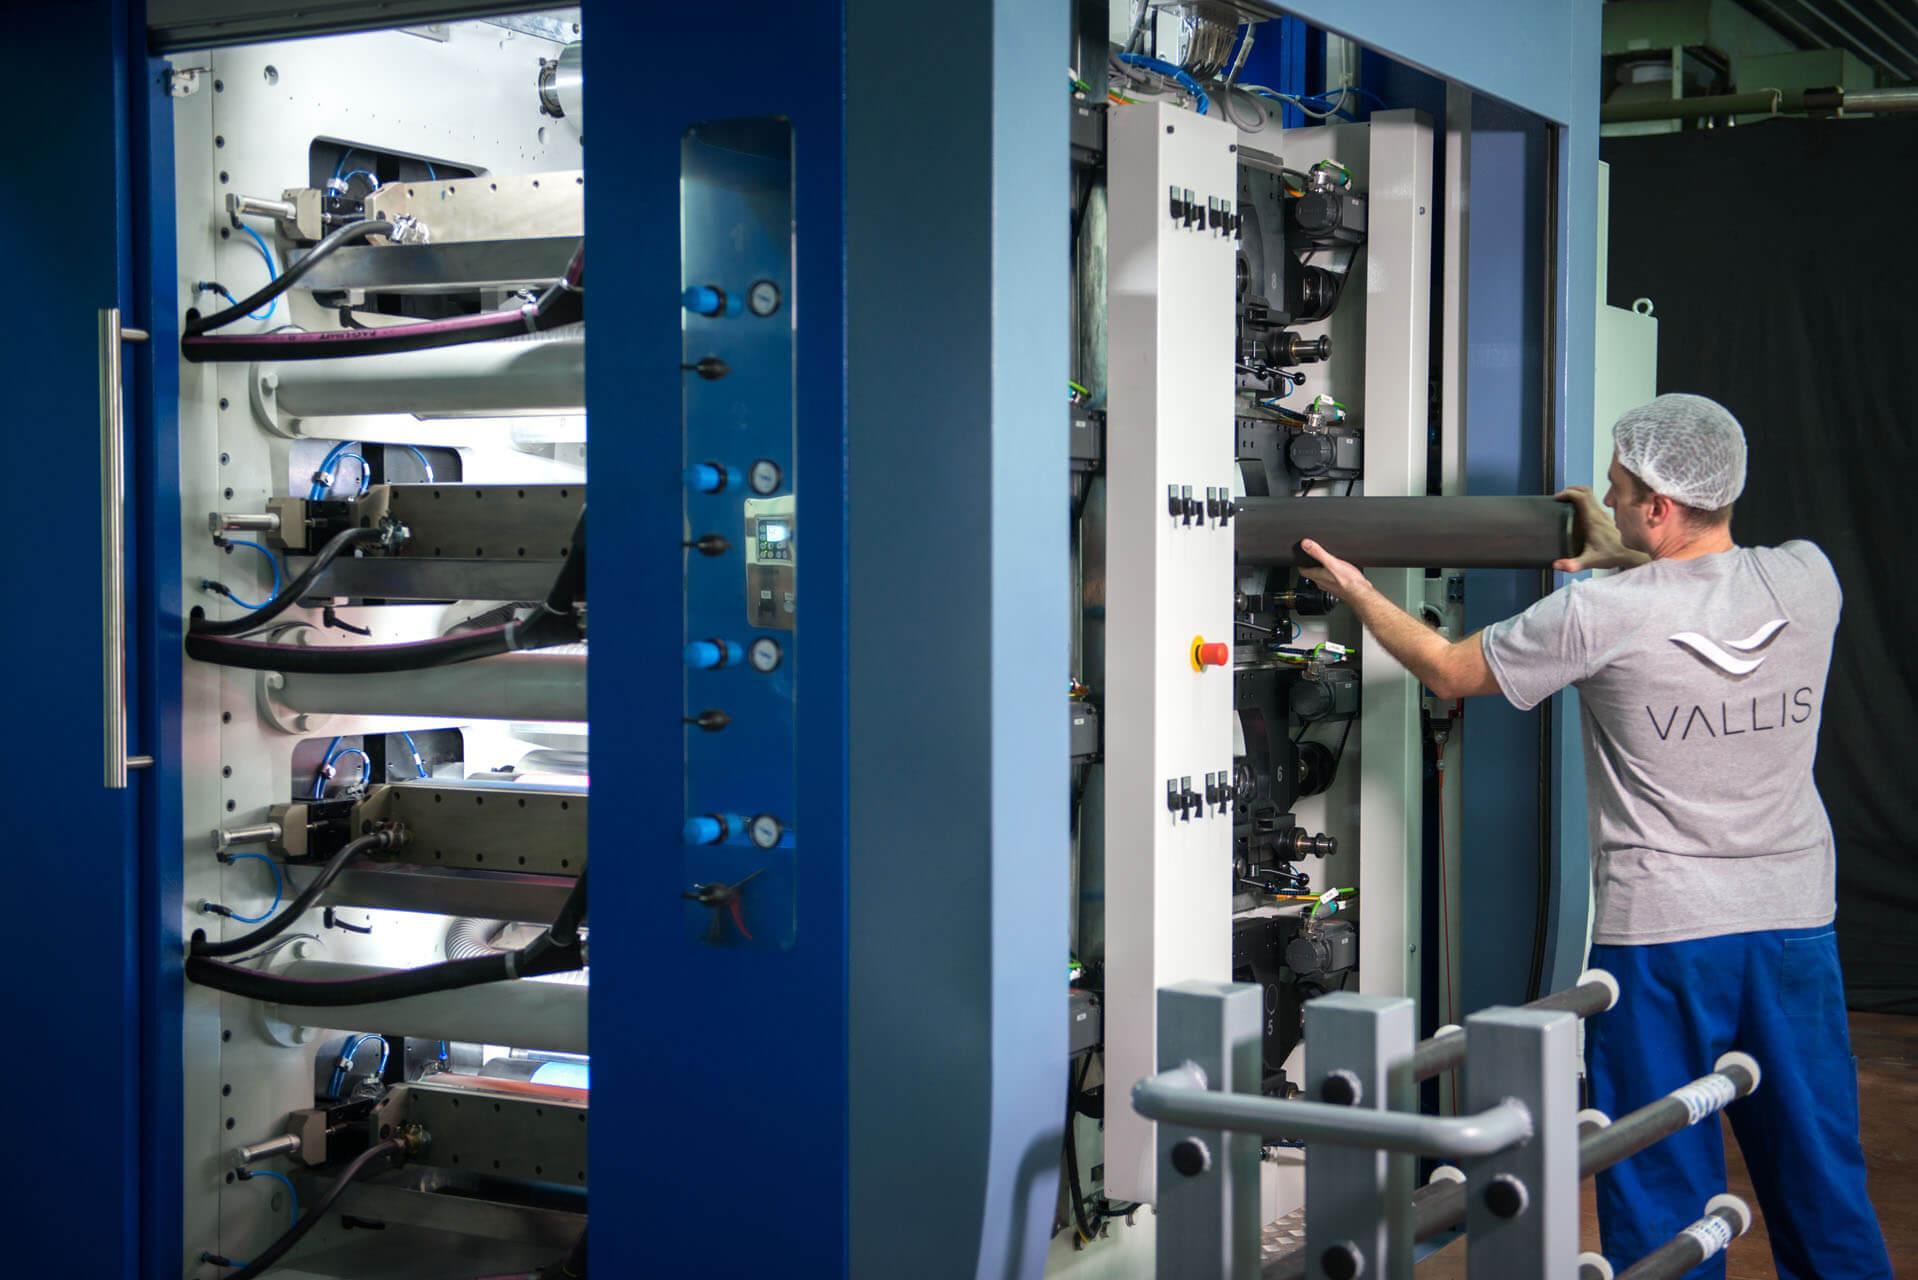 flexo-printing-machine-S10-vallis-06